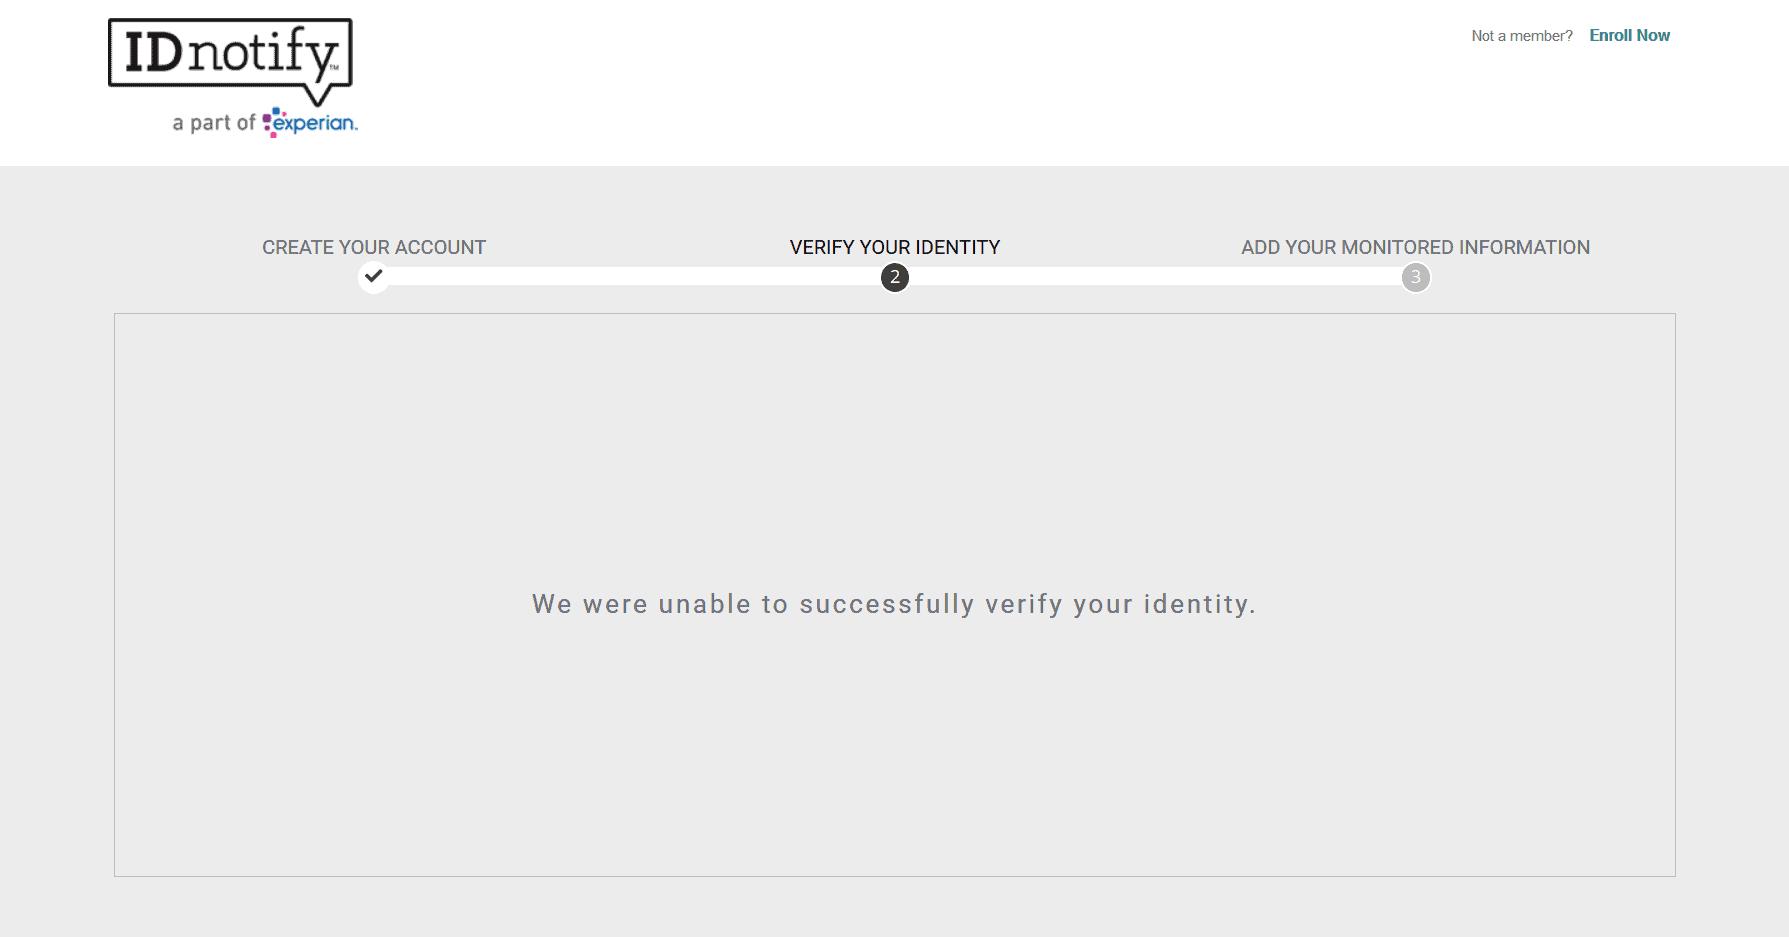 IDnotify - Verifying Identity Screen